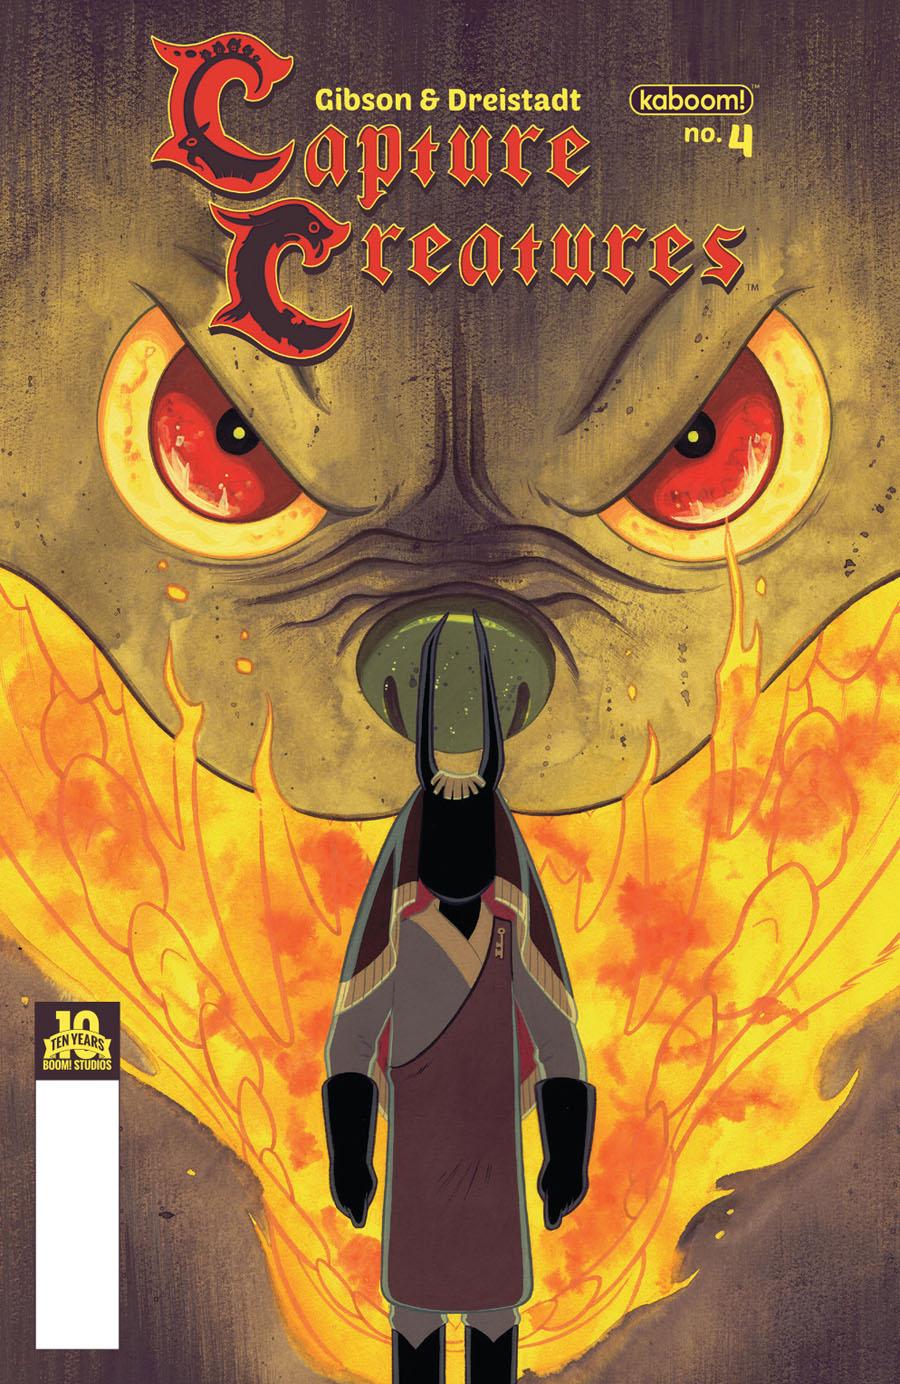 Capture Creatures #4 Cover A Regular Becky Dreistadt Cover